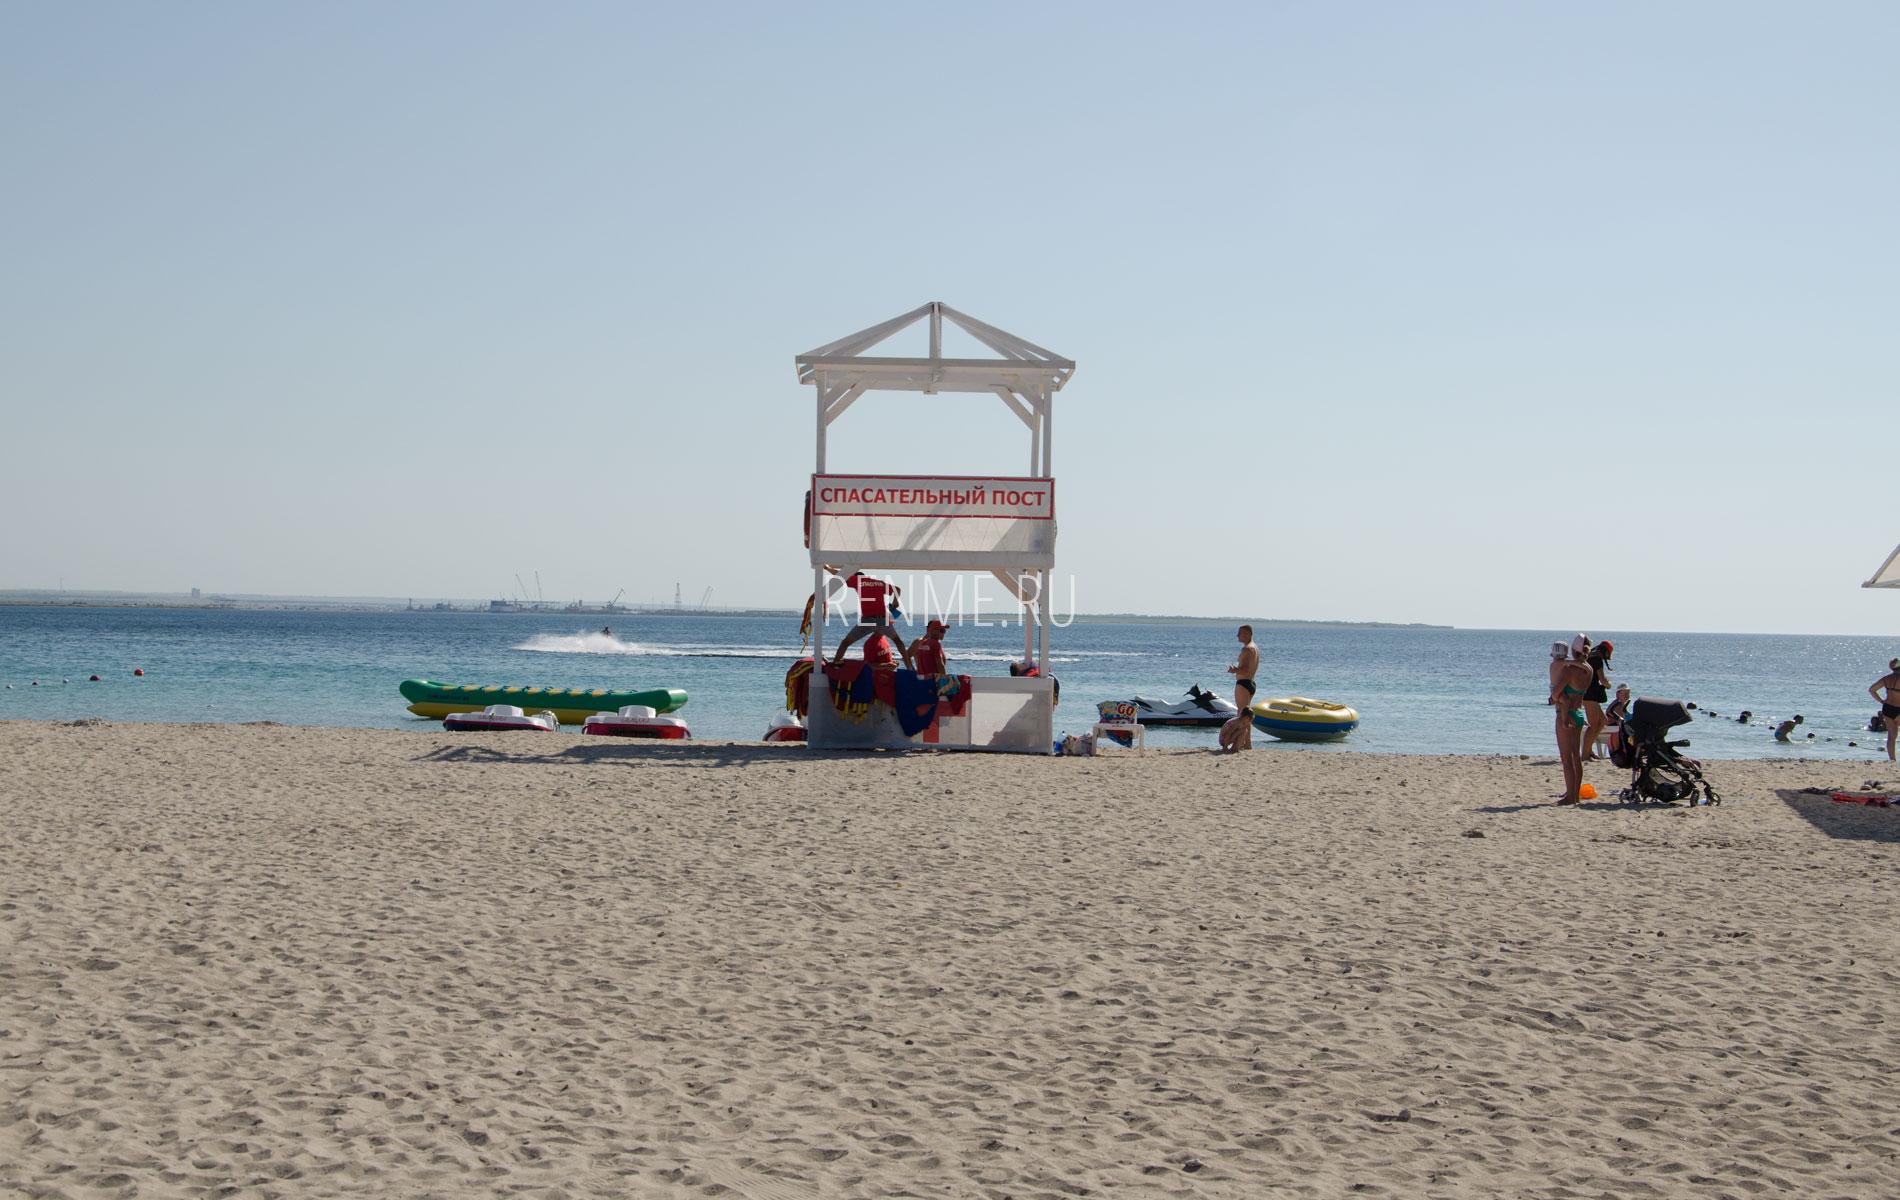 Спасатели на пляже в Межводном. Фото Межводного